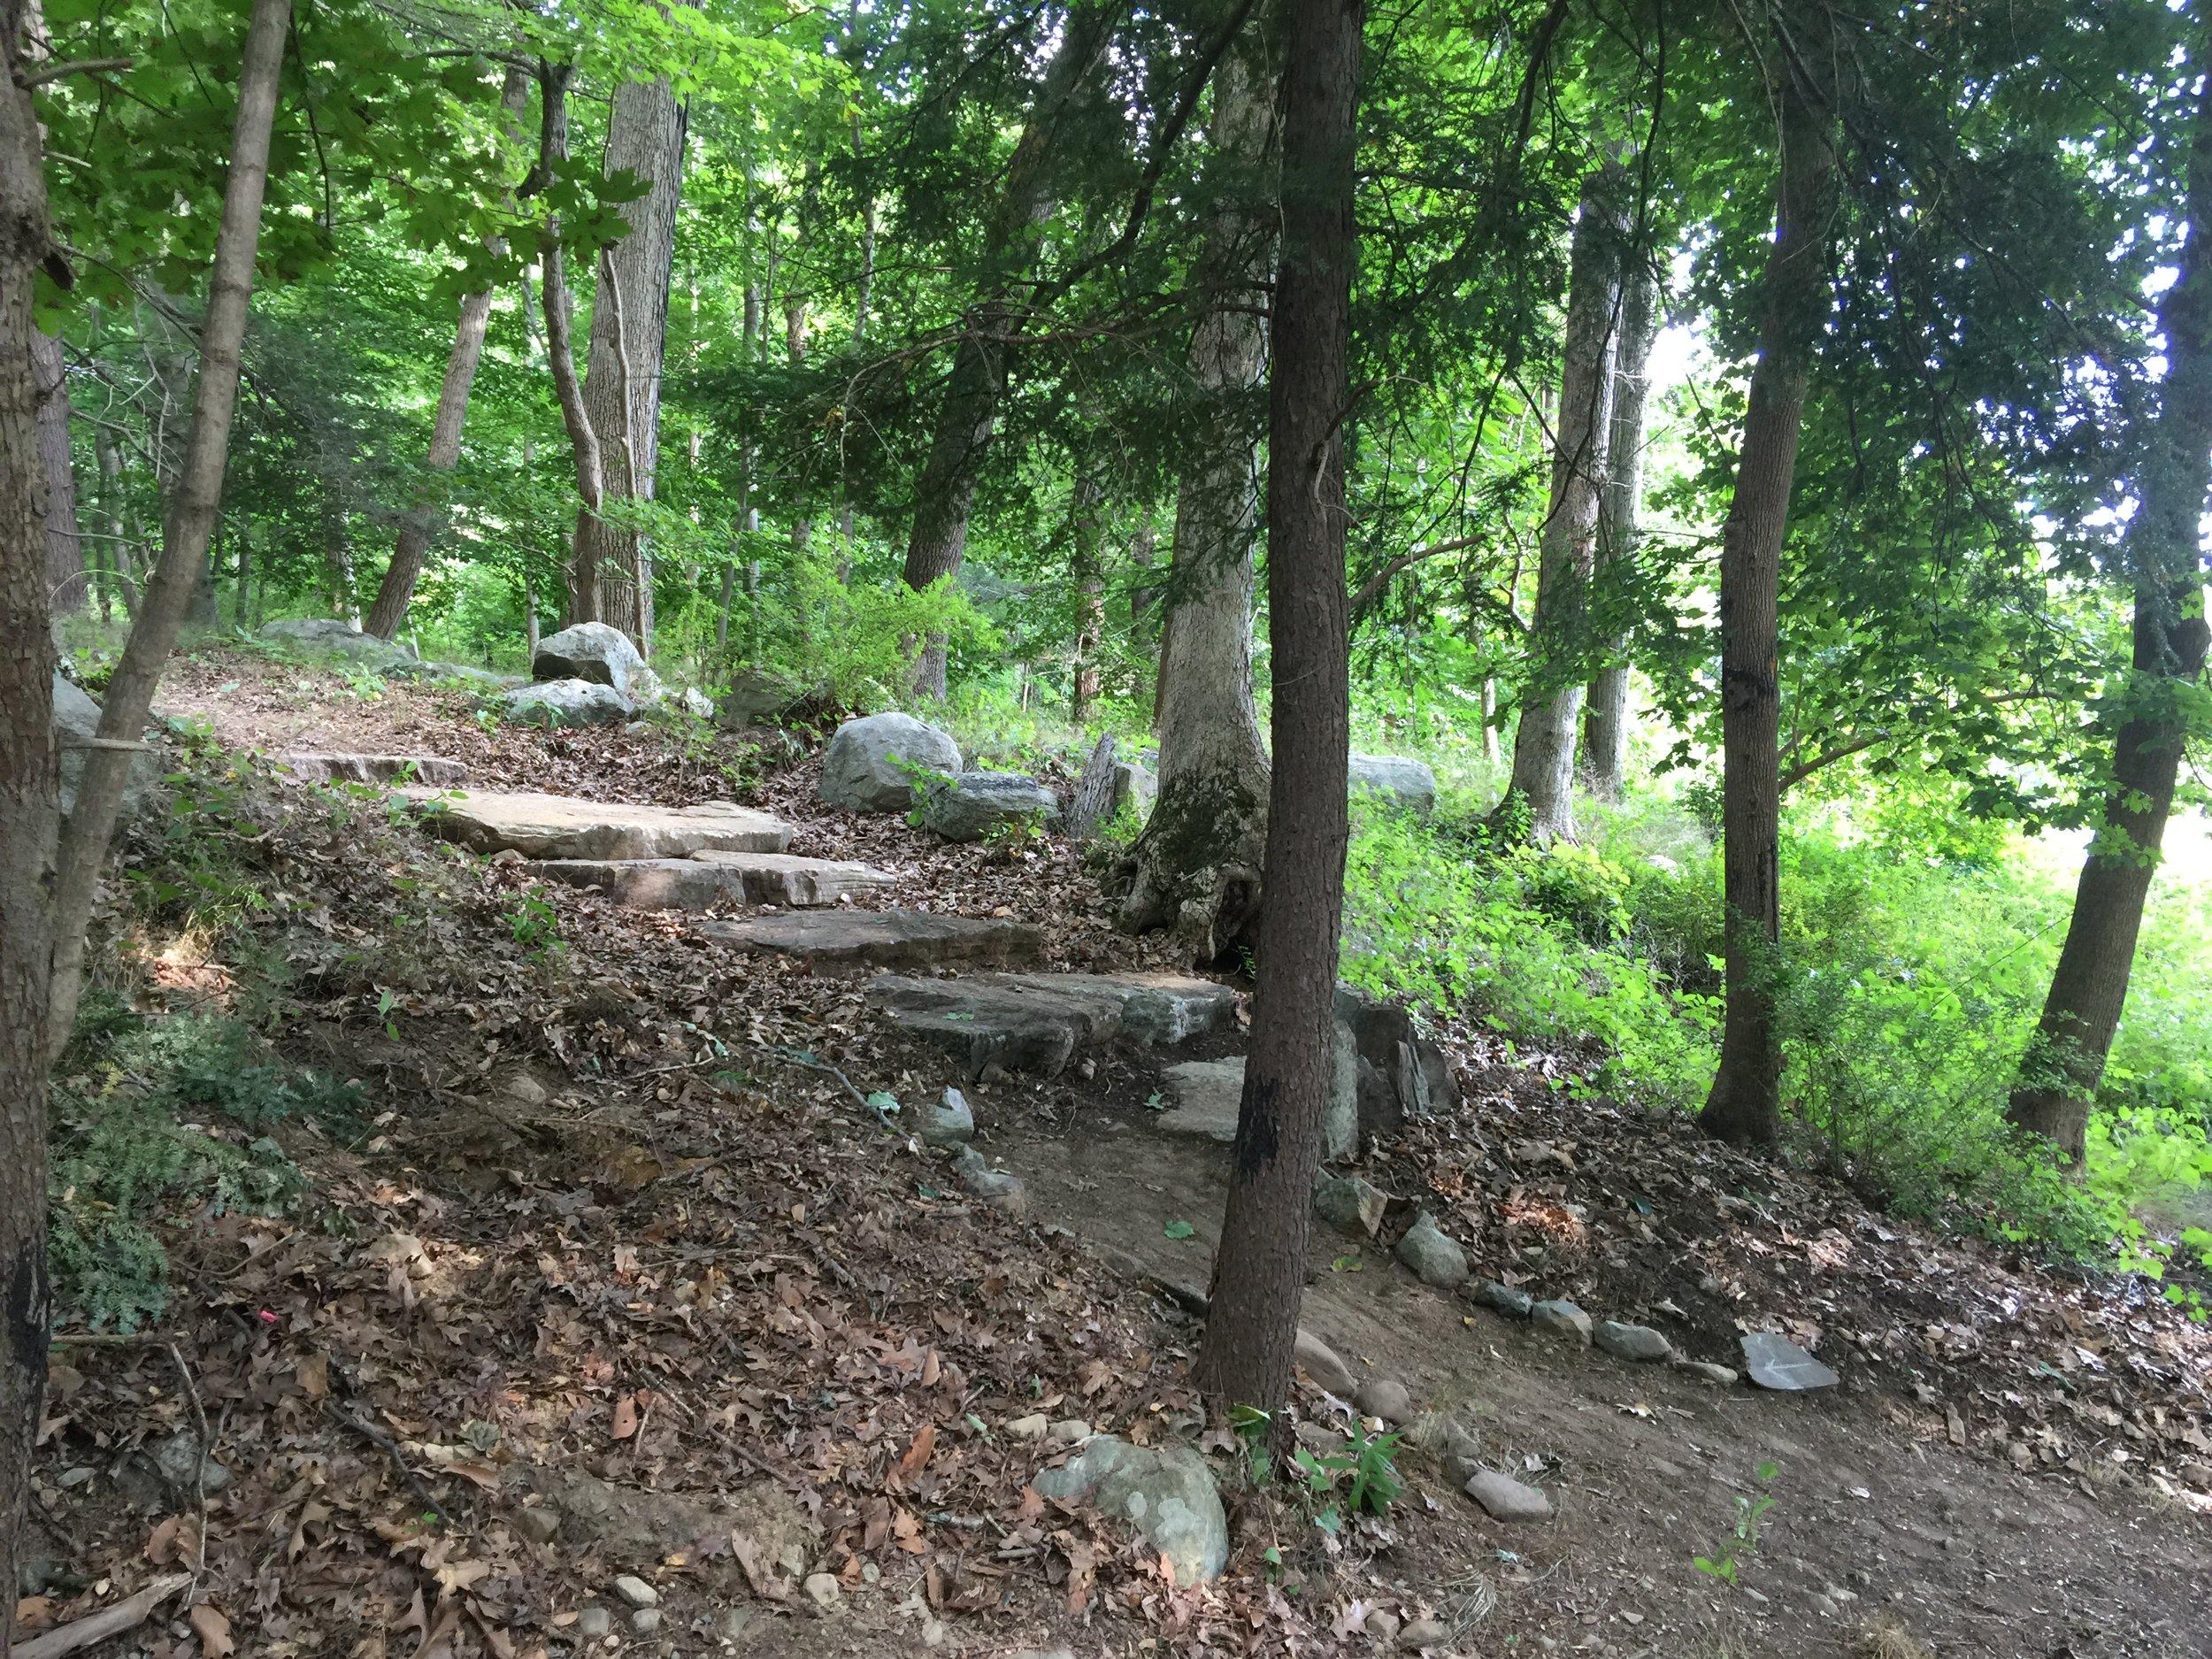 New stone steps